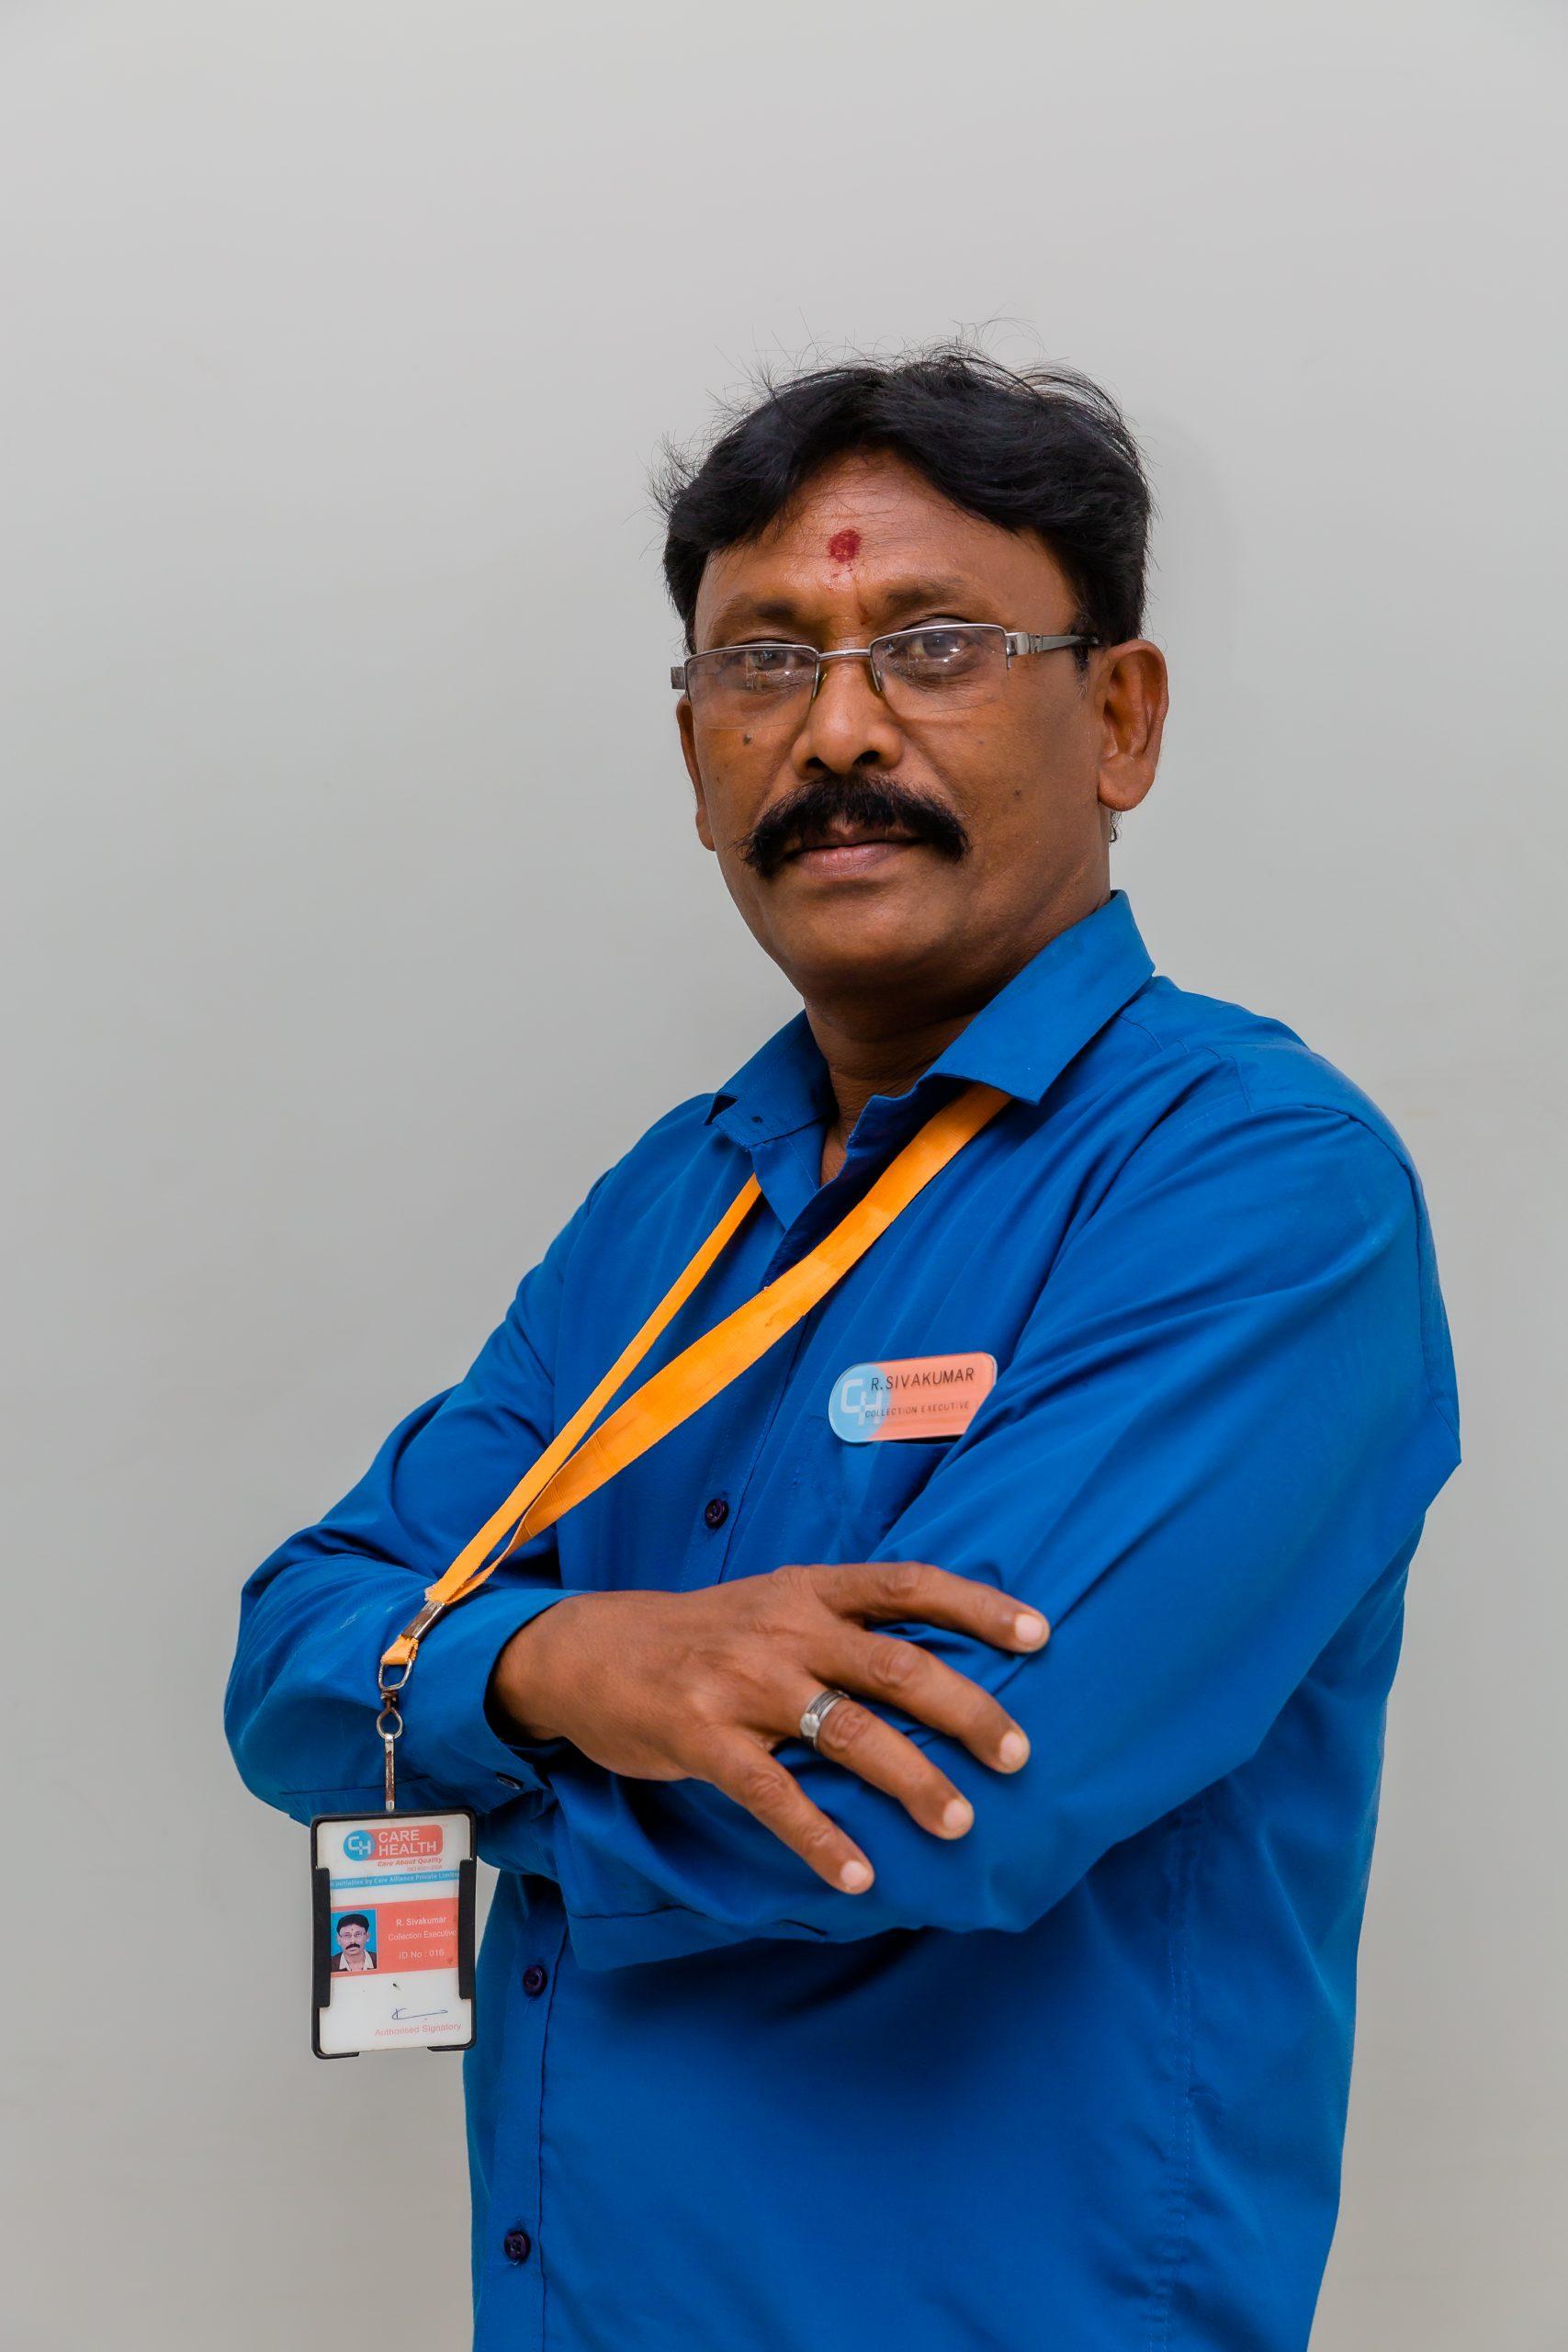 Malae staff member wearing blue shirt and ID badge